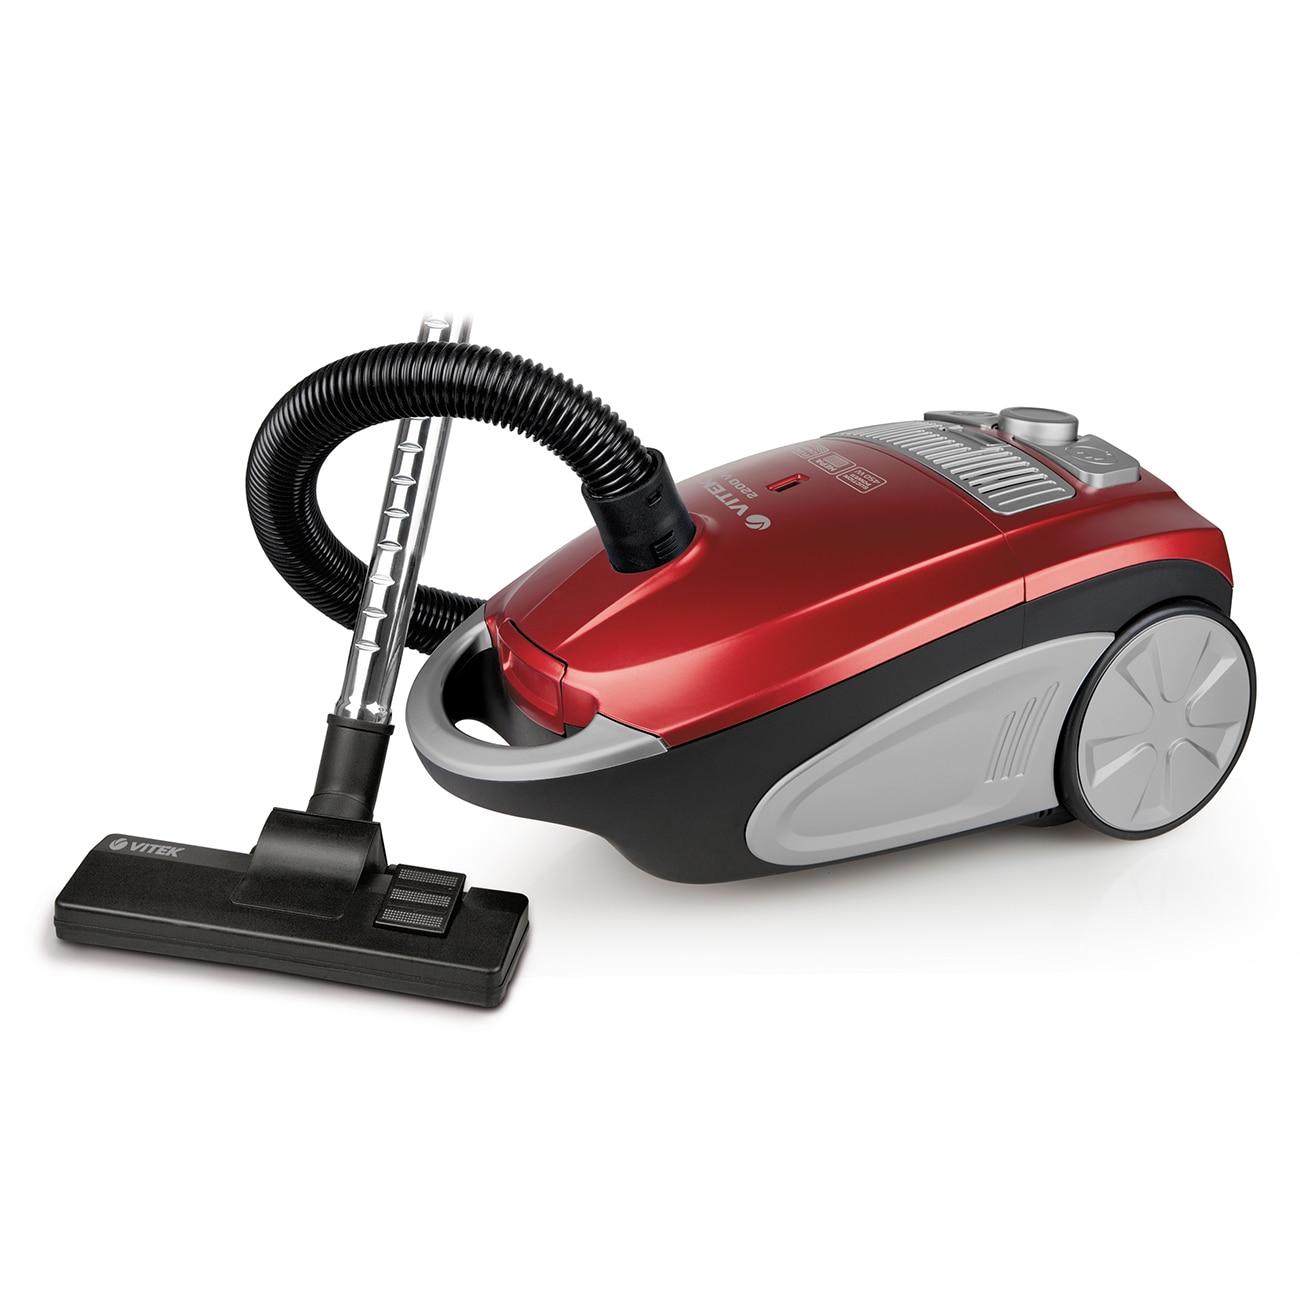 The electric vacuum cleaner Vitek VT-1892 R пылесос vitek vt 1892 r